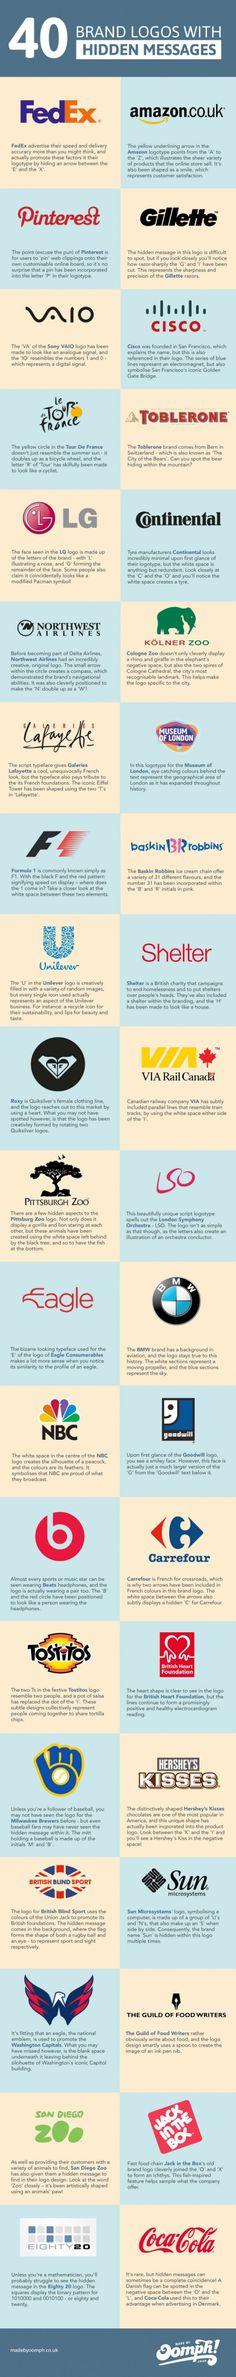 40 Logos mit verborgener Botschaft: inkl. Kölner Zoo - #Köln #Cologne - 40 Logos With Hidden Messages